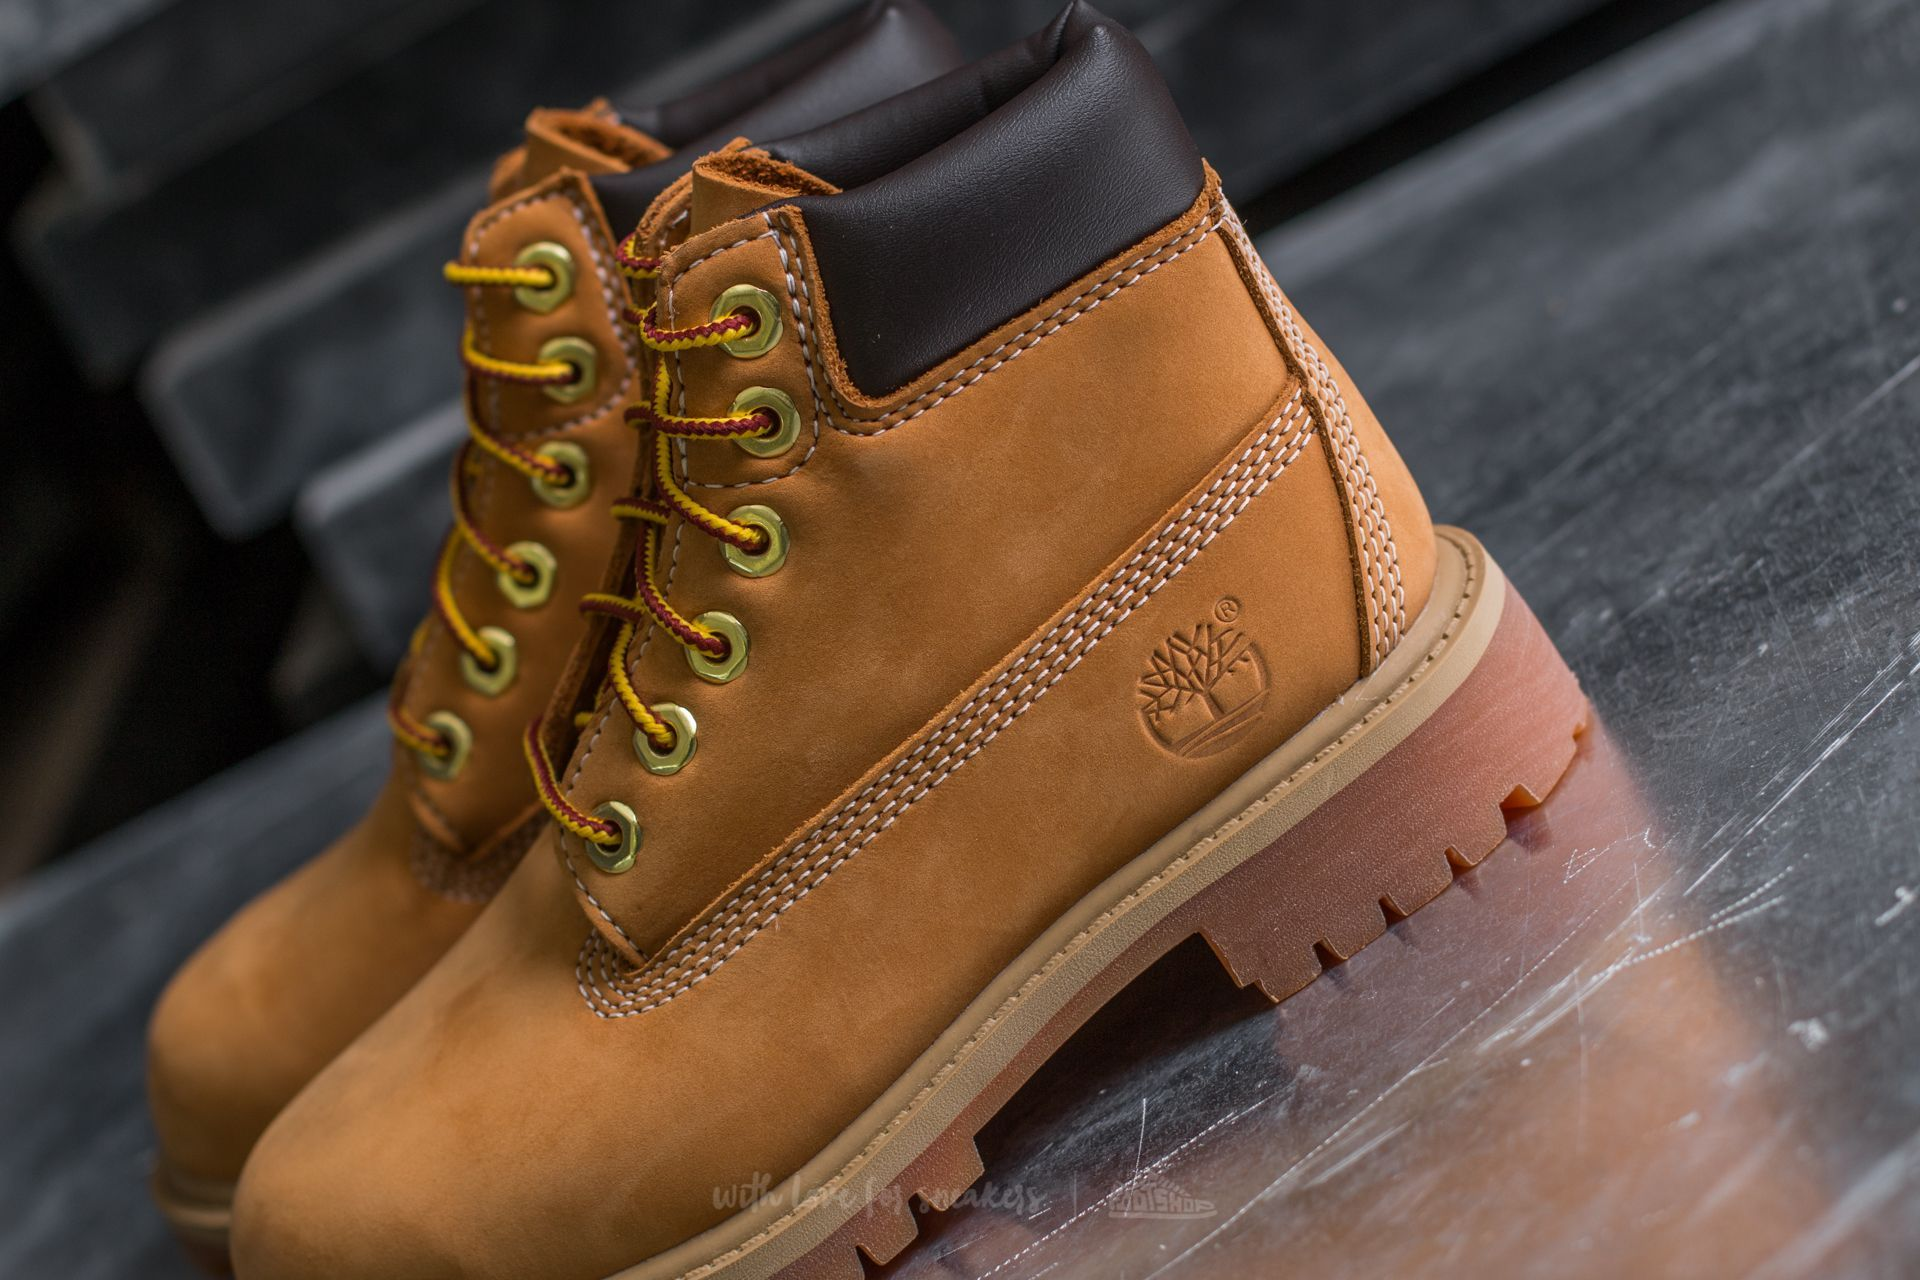 Timberland 6 In Premium Wheat Nubuc Yellow za skvělou cenu 3 190 Kč koupíte  na Footshop.cz b68328ccb4